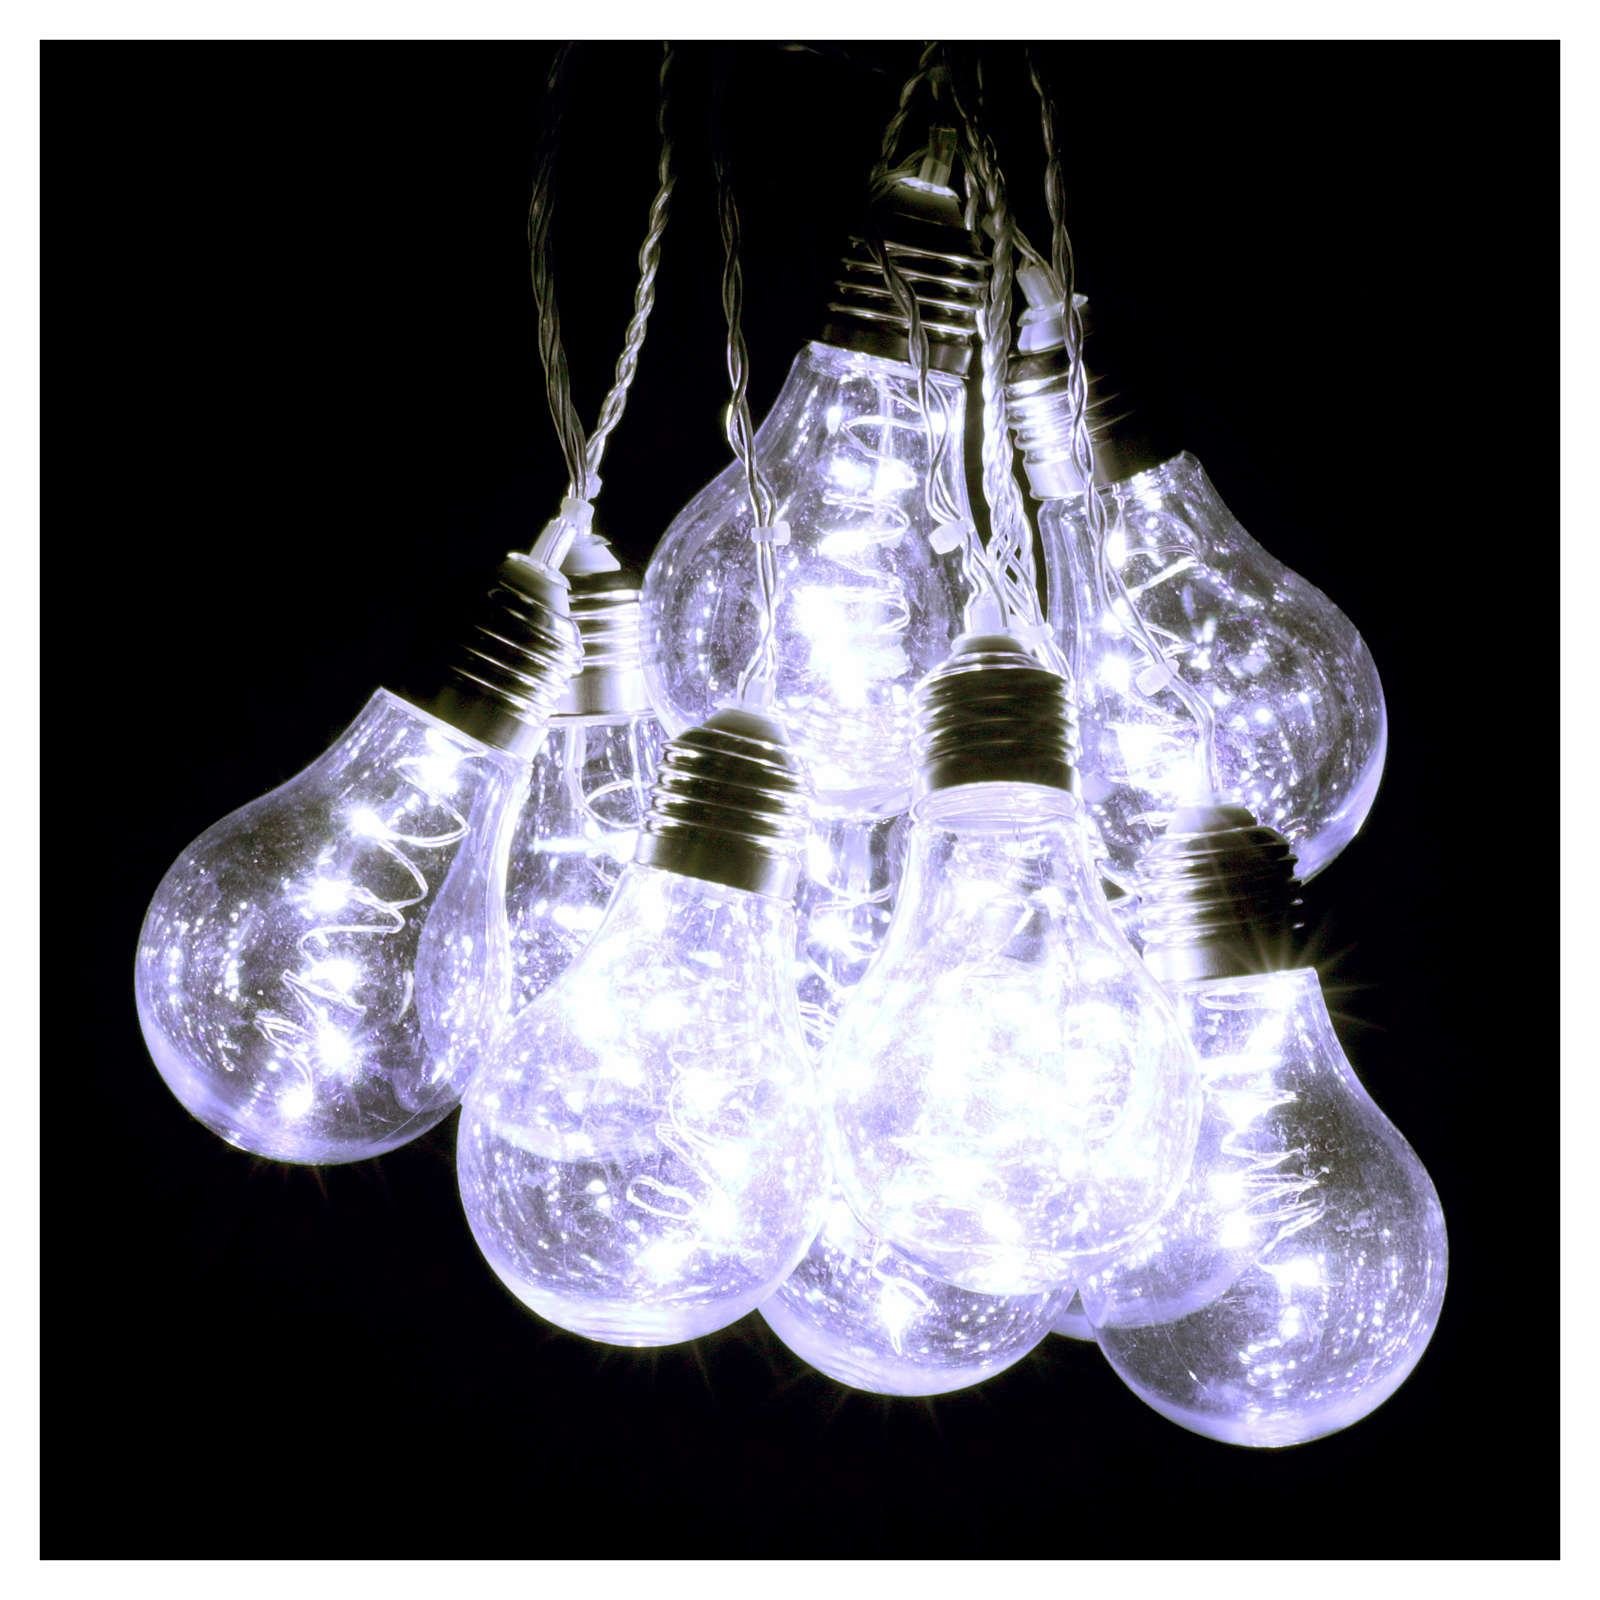 Illuminated light curtain 10 light bulbs 60 Nanoleds ice white internal and external use 3